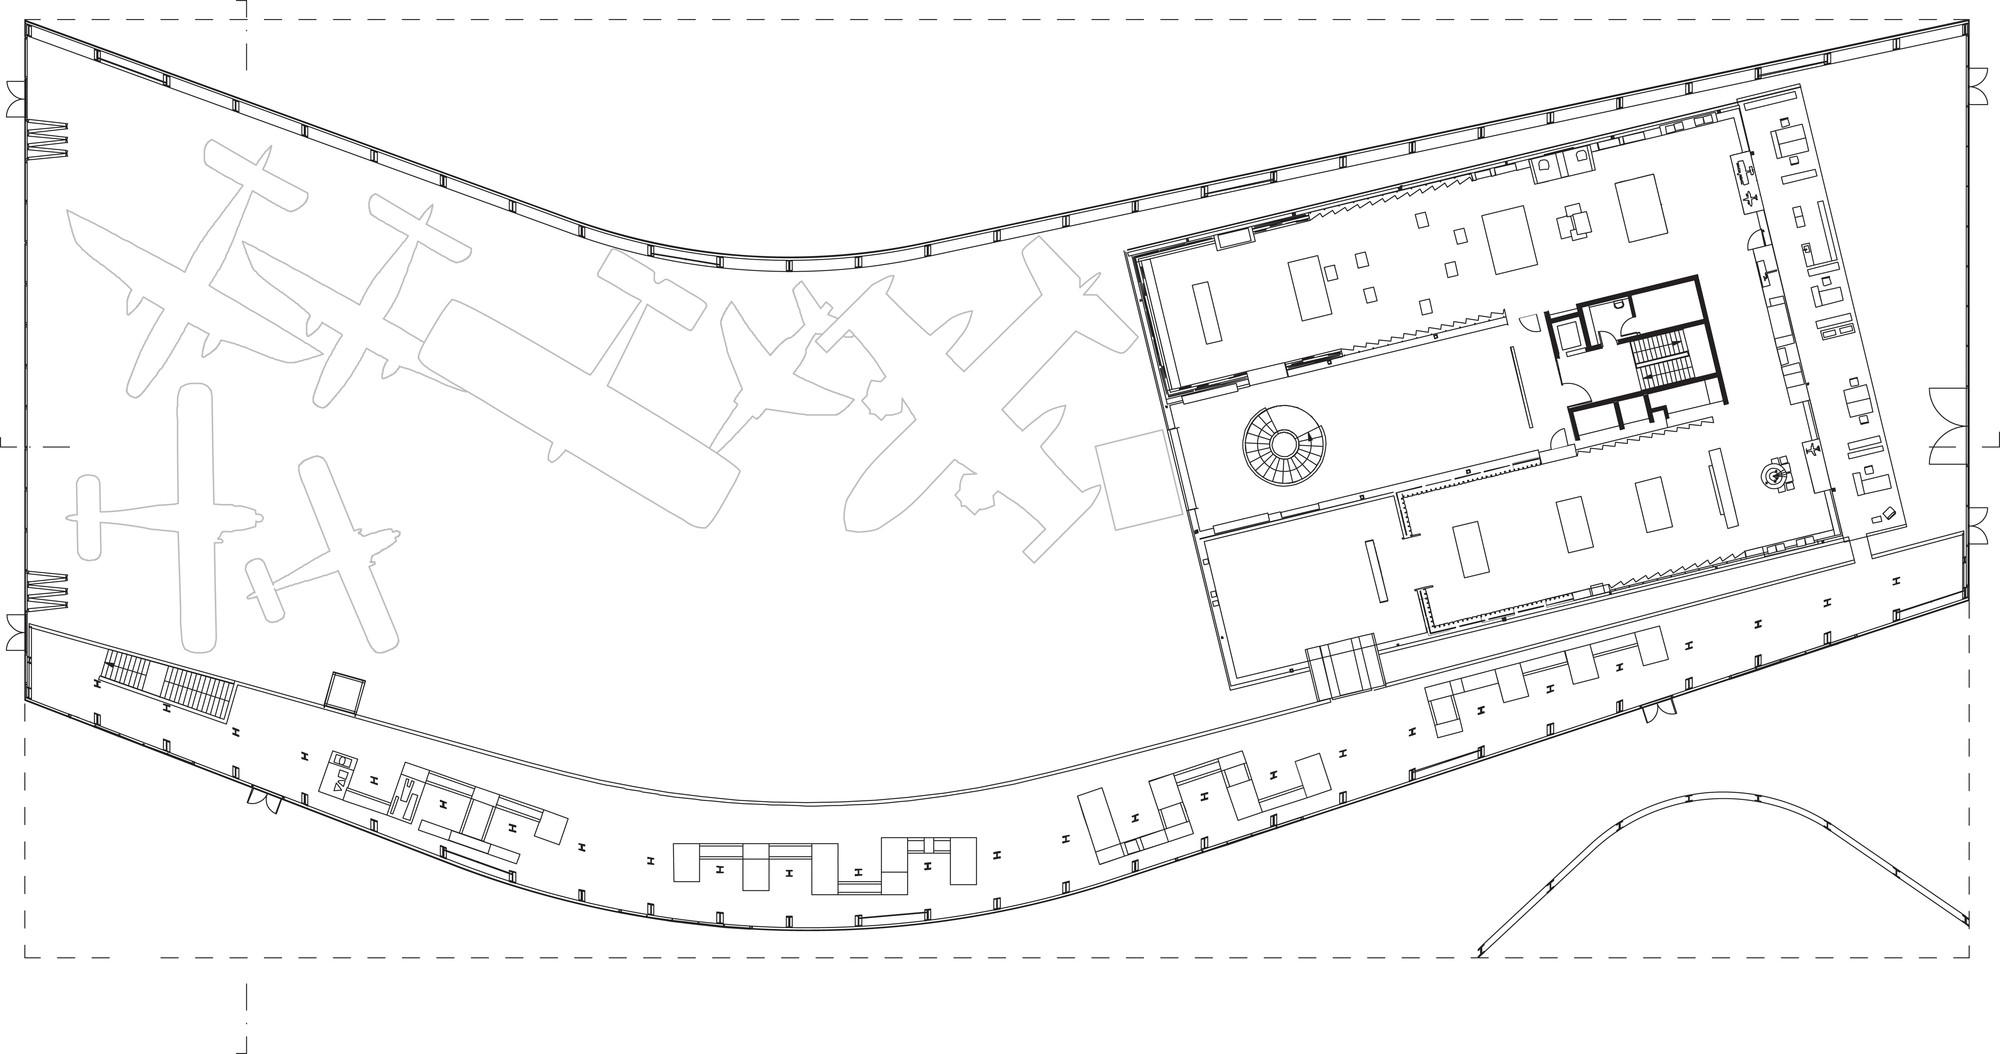 gallery of dornier museum allmann sattler wappner architekten 14. Black Bedroom Furniture Sets. Home Design Ideas